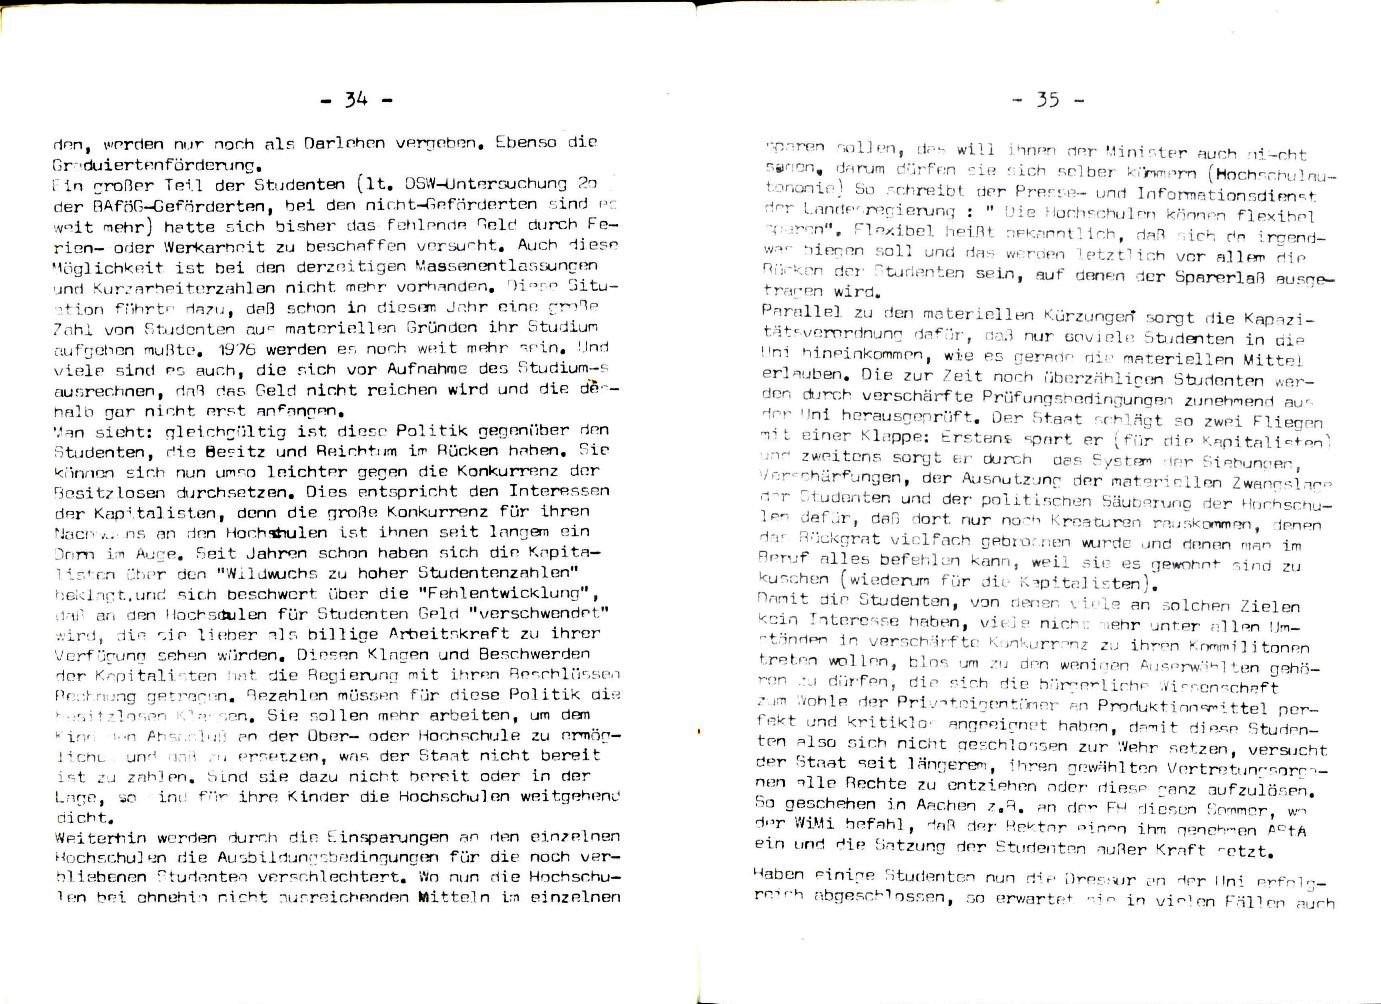 Aachen_KHI_1975_Krise_18